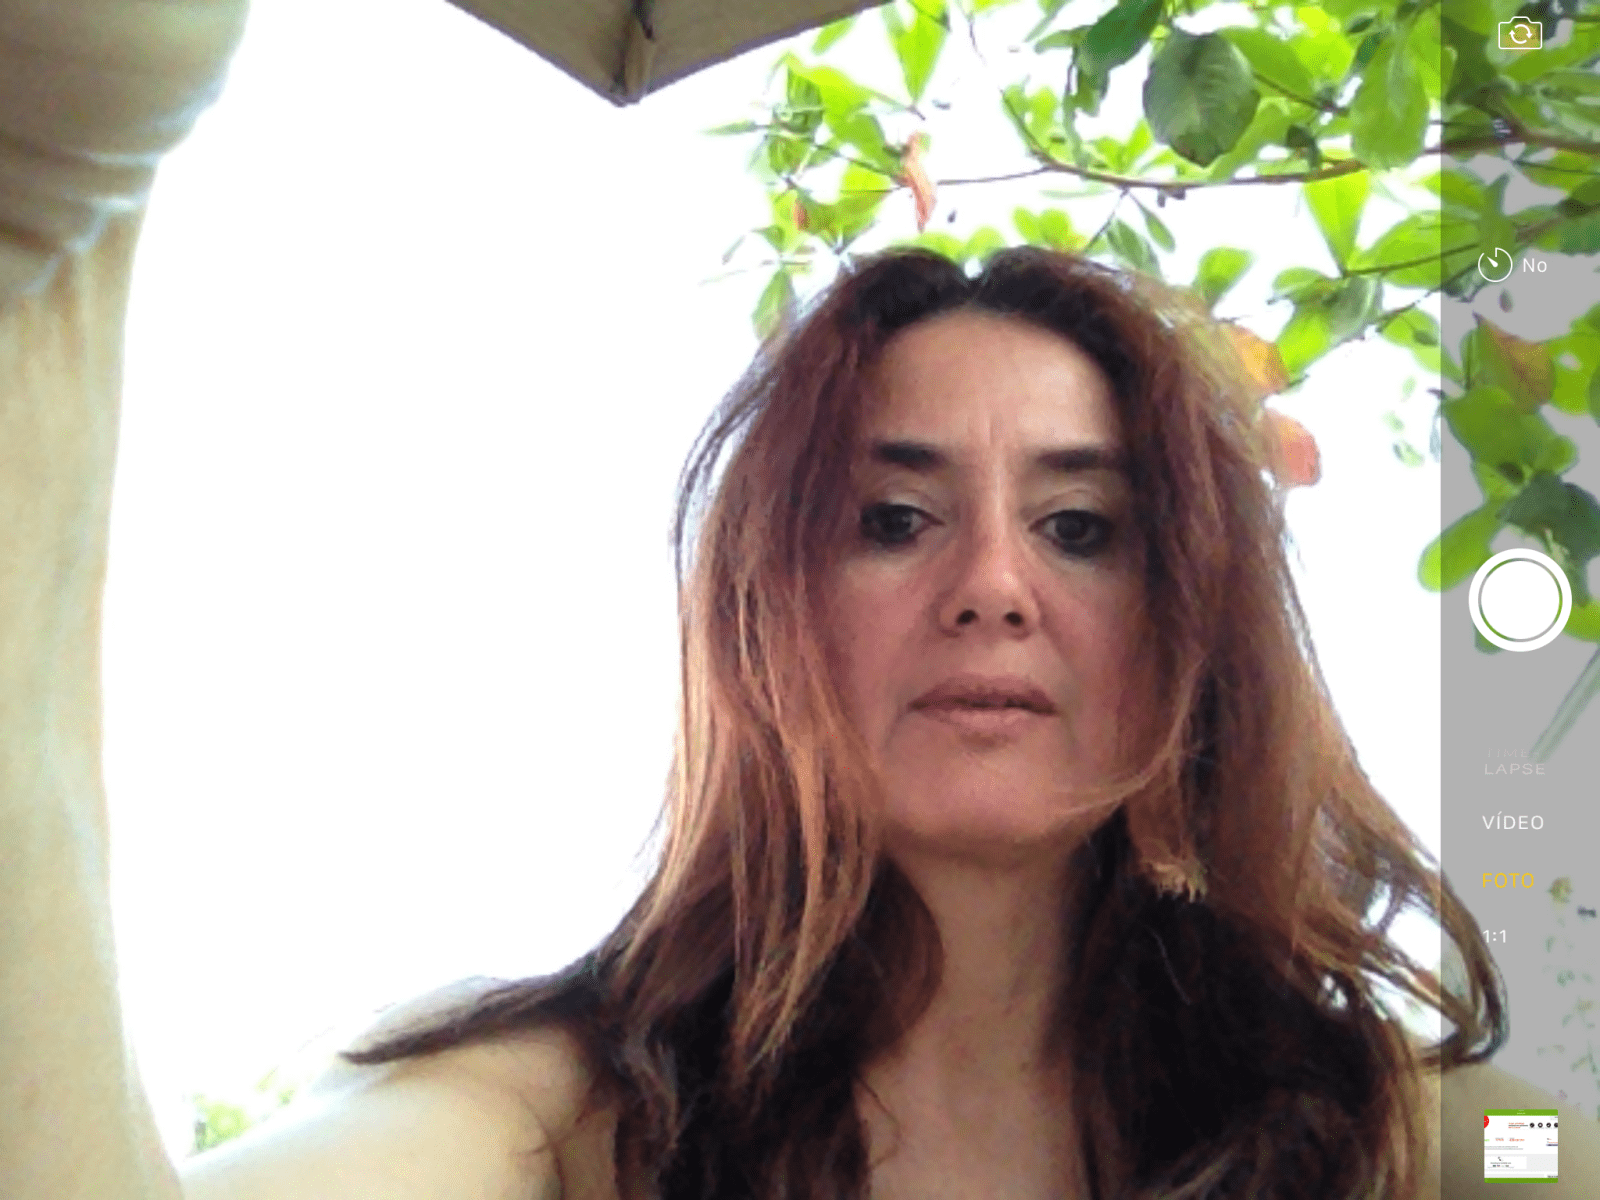 Herlinda lorena from Monclova, Mexico